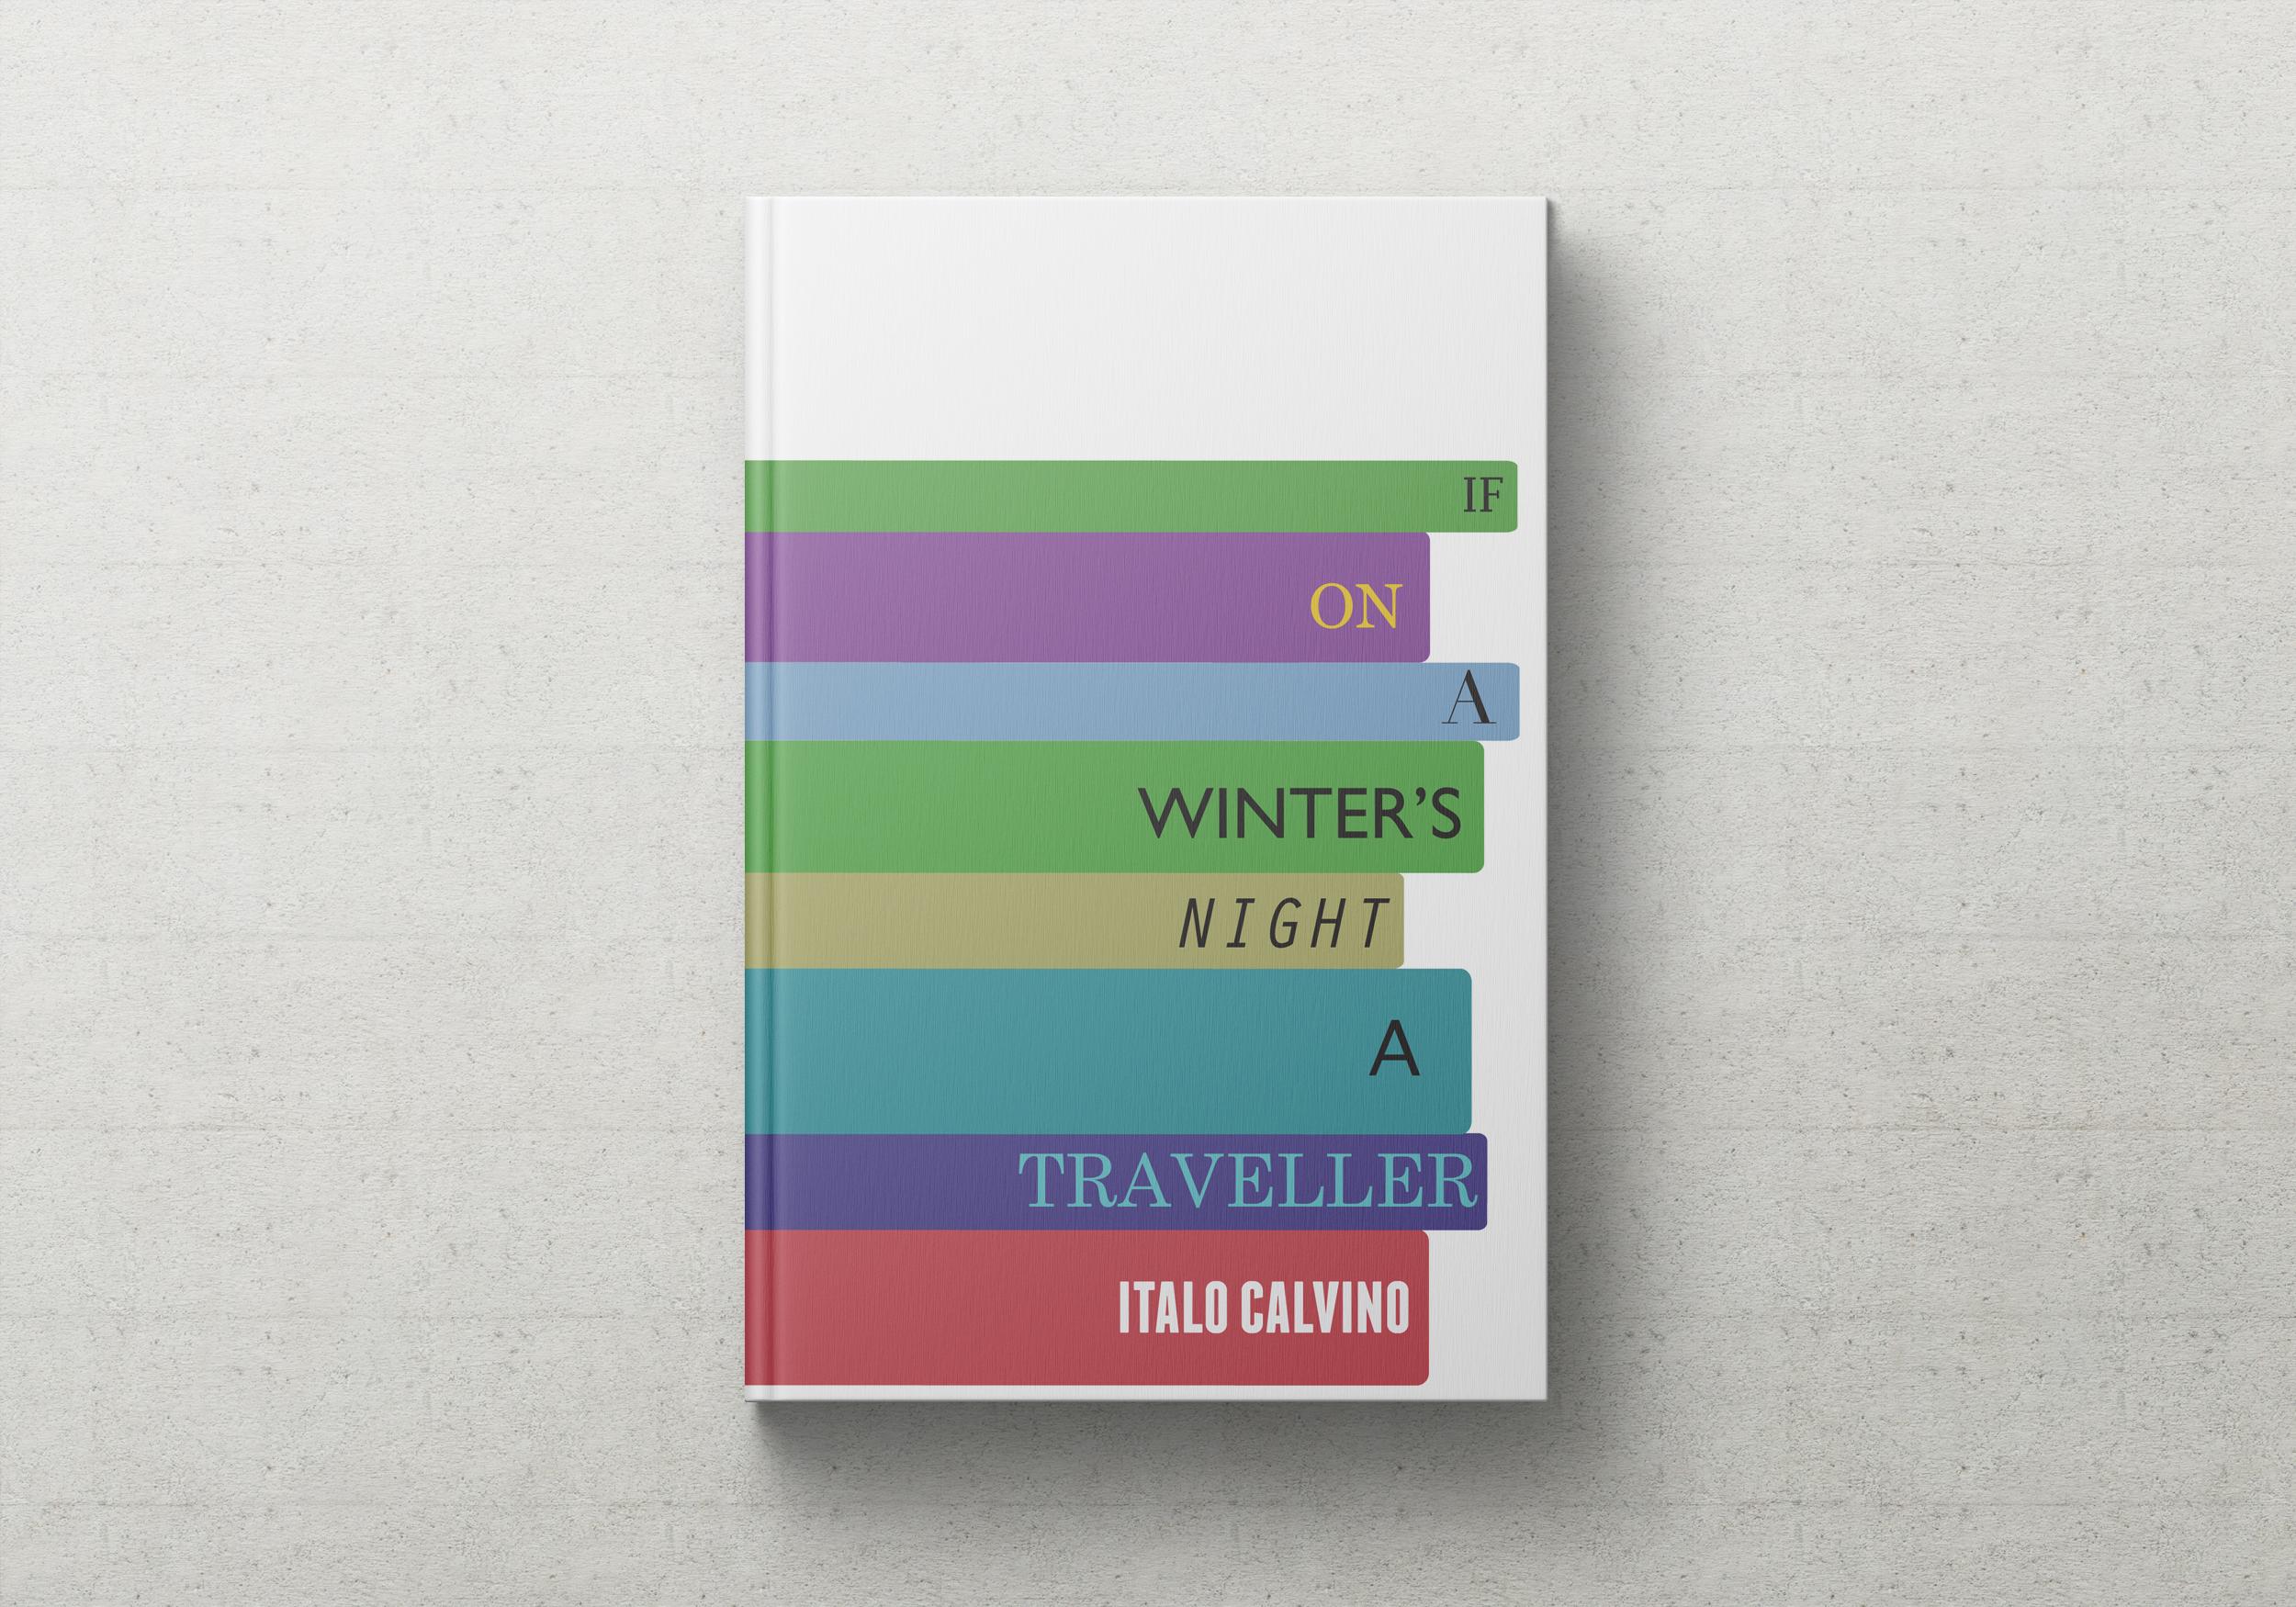 IF ON A WINTER'S NIGHT A TRAVELLER Italo Calvino